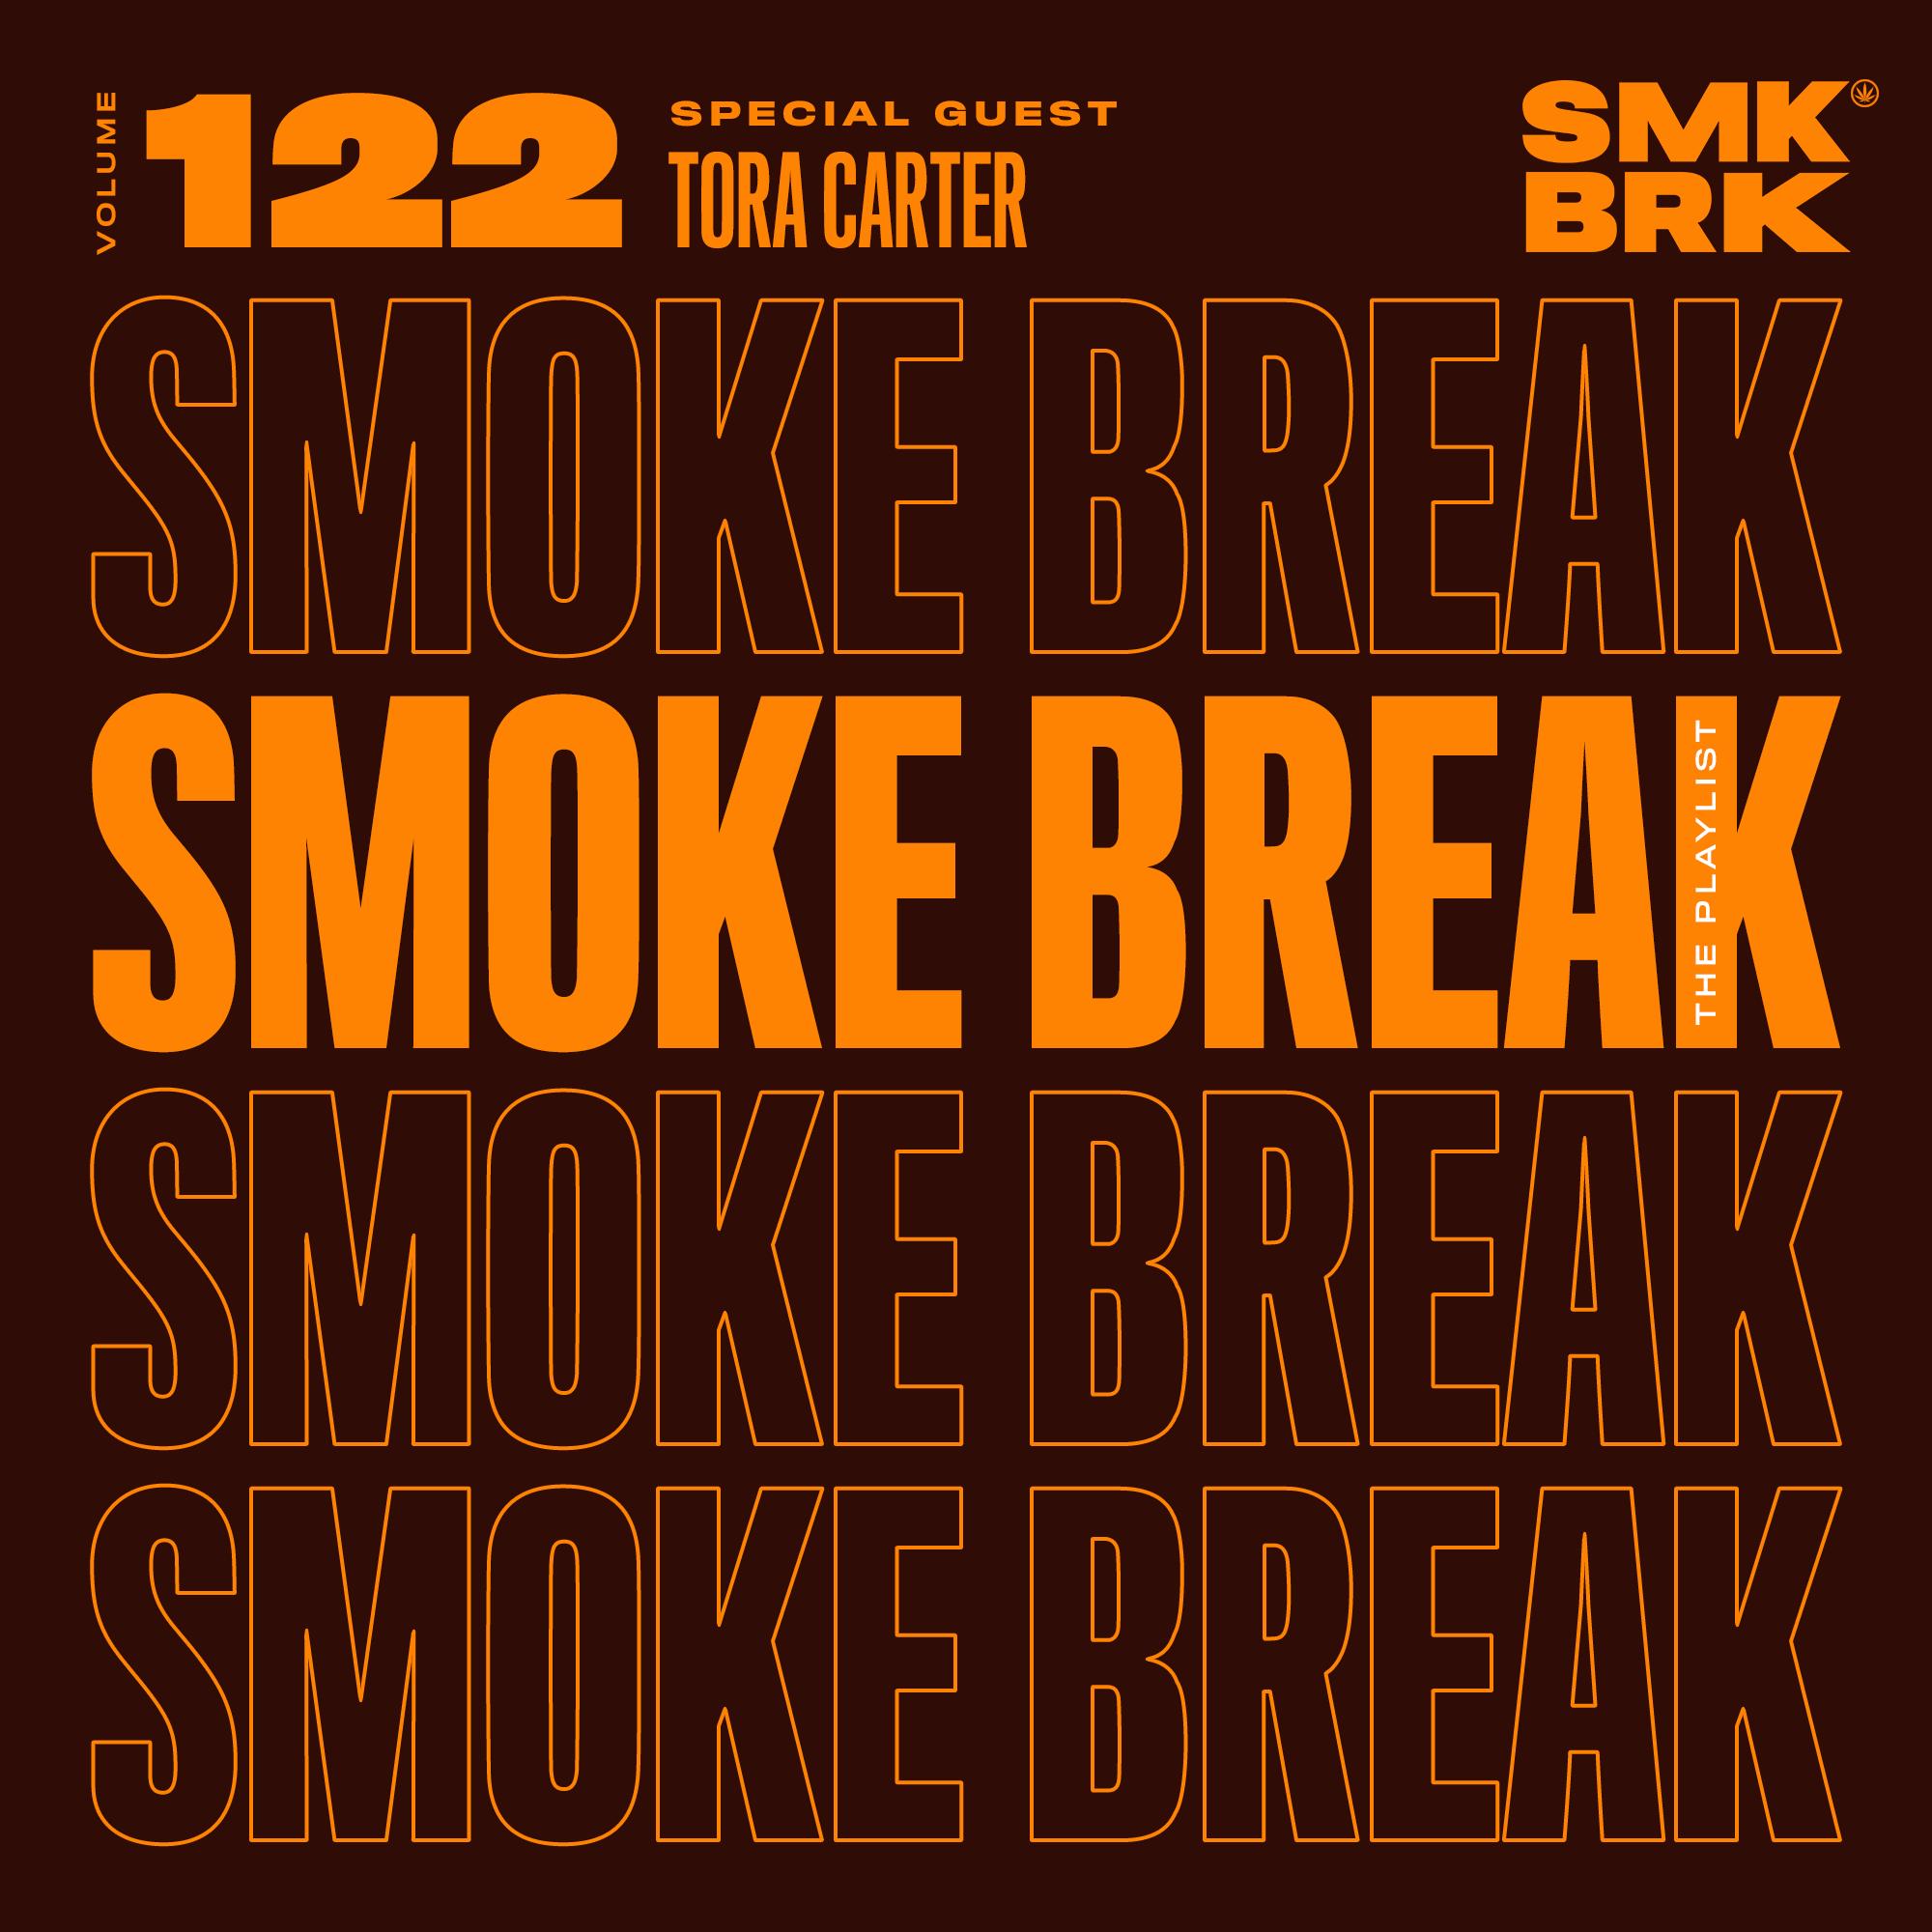 SMK BRK playlist vol 122 front cover tora carter